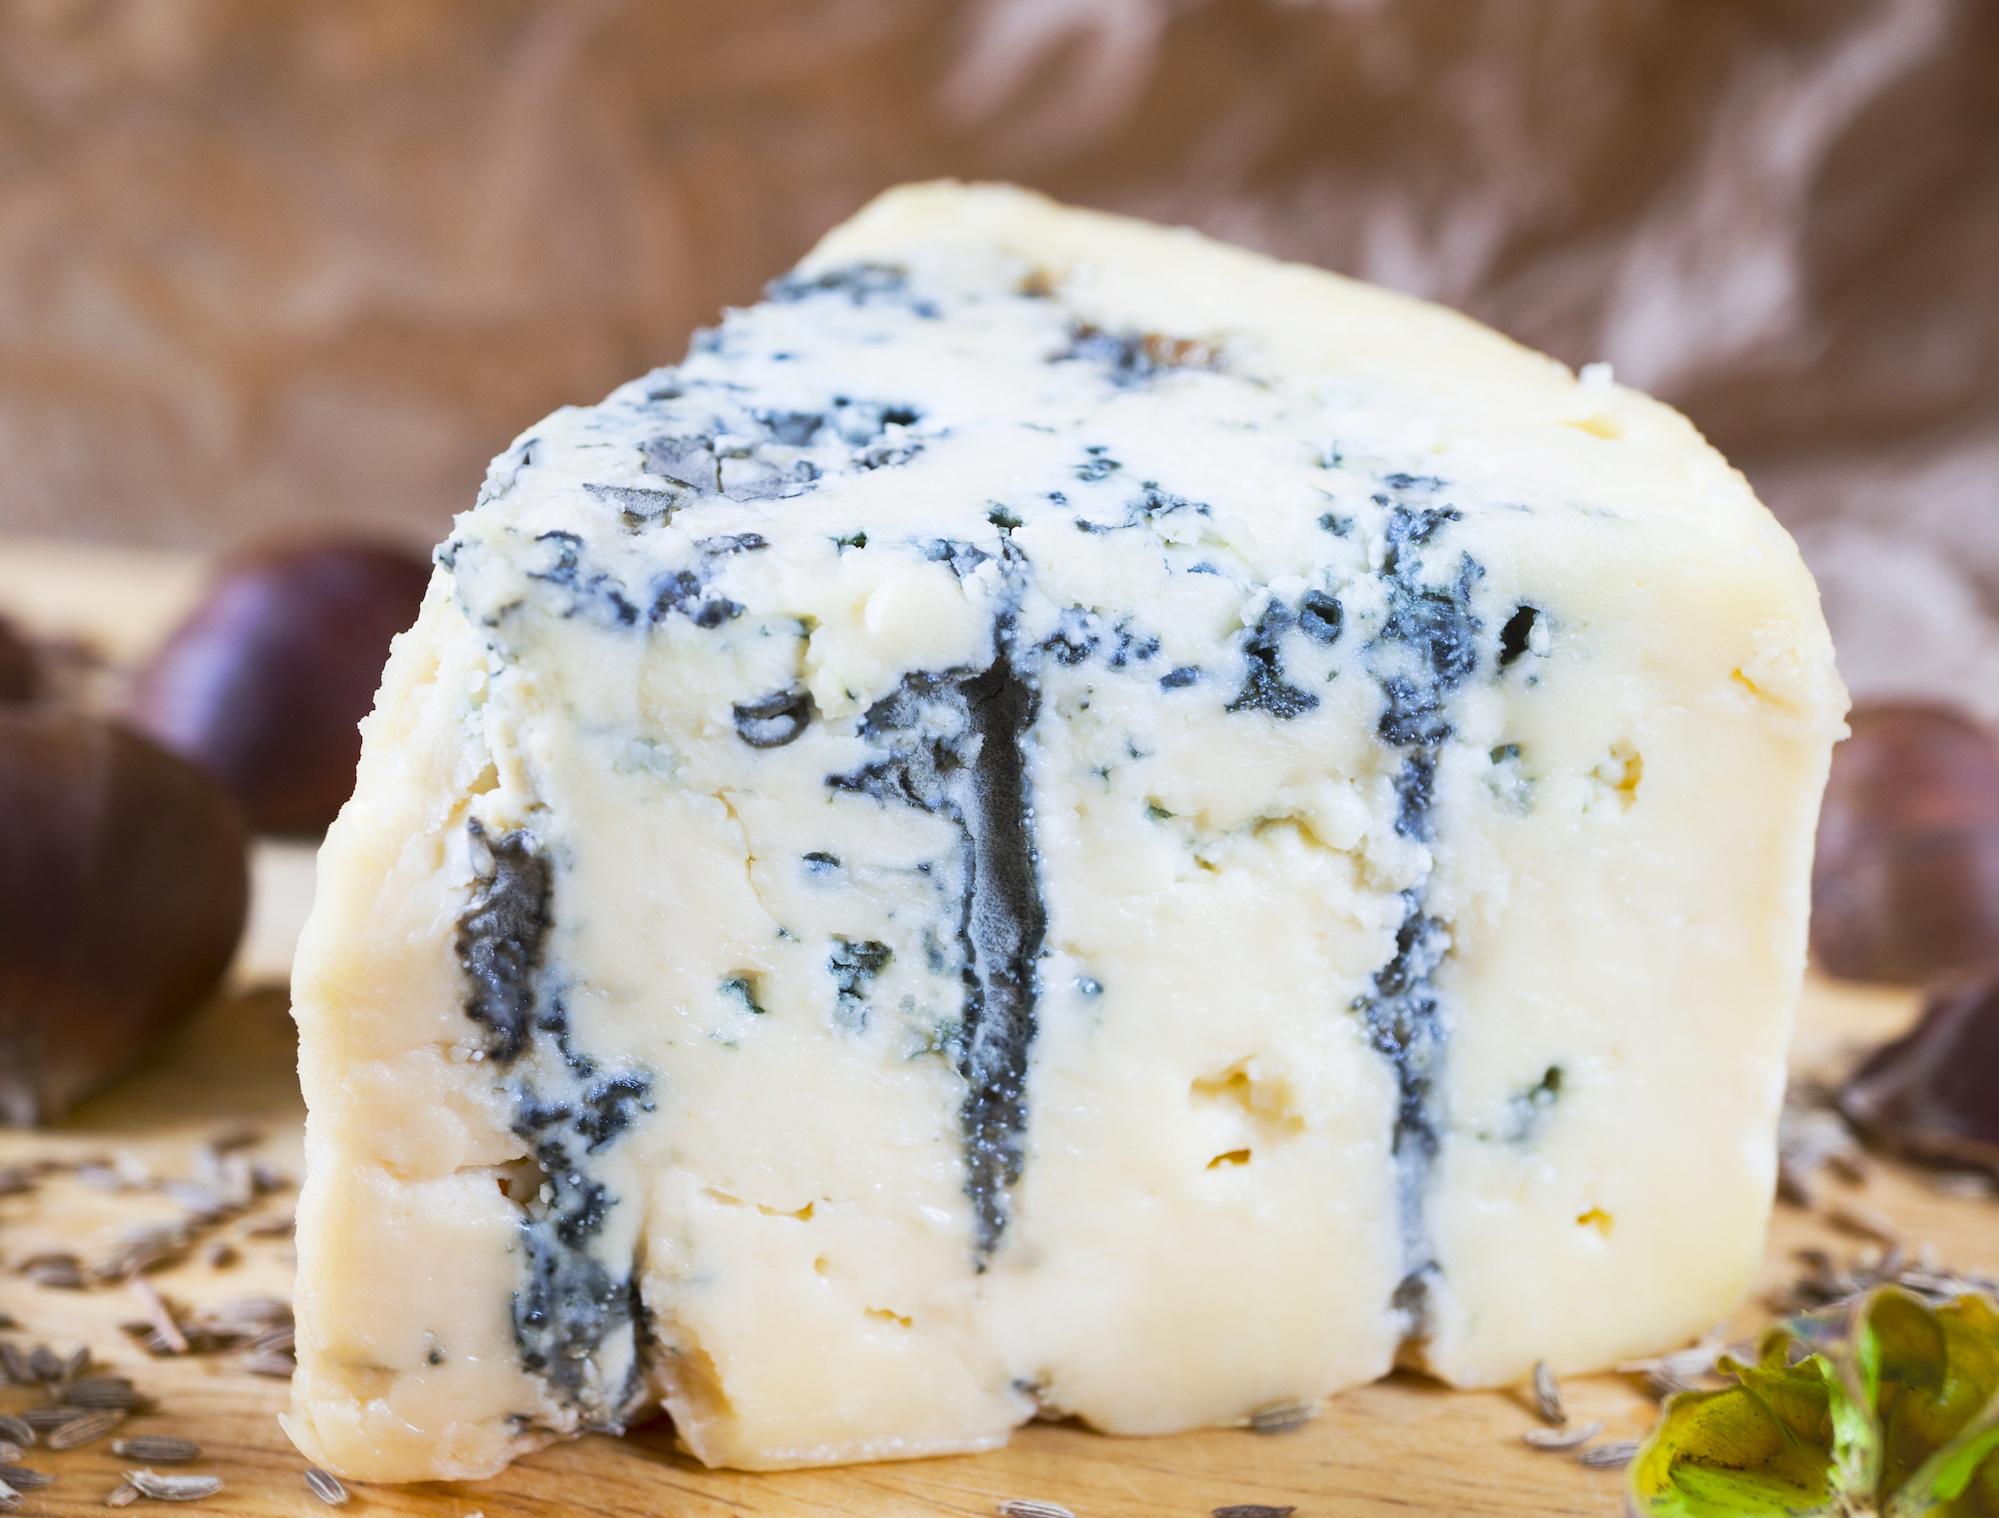 Fresh Blue Cheese AdobeStock 132861311 copy